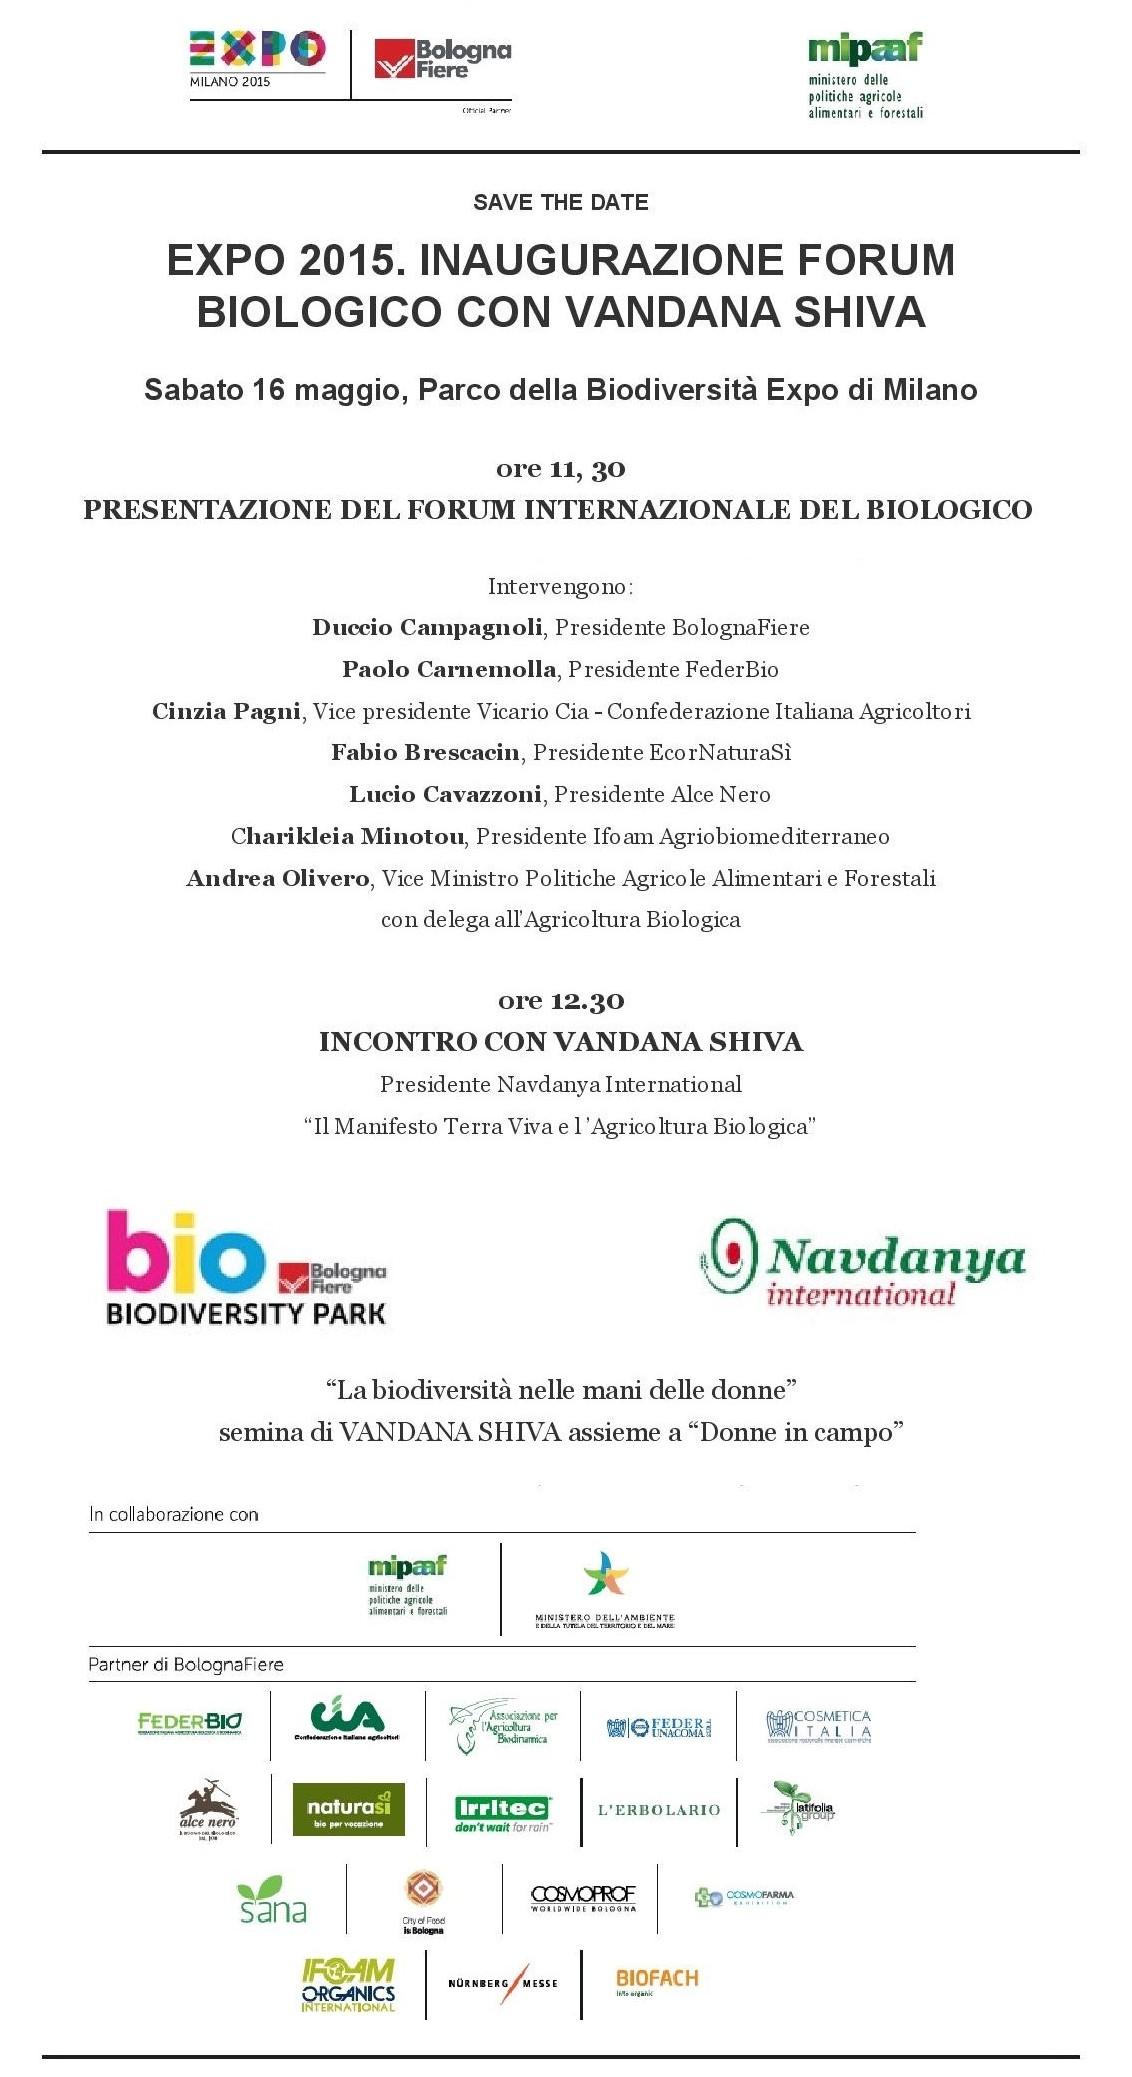 Vandana Shiva inaugura forum biologico